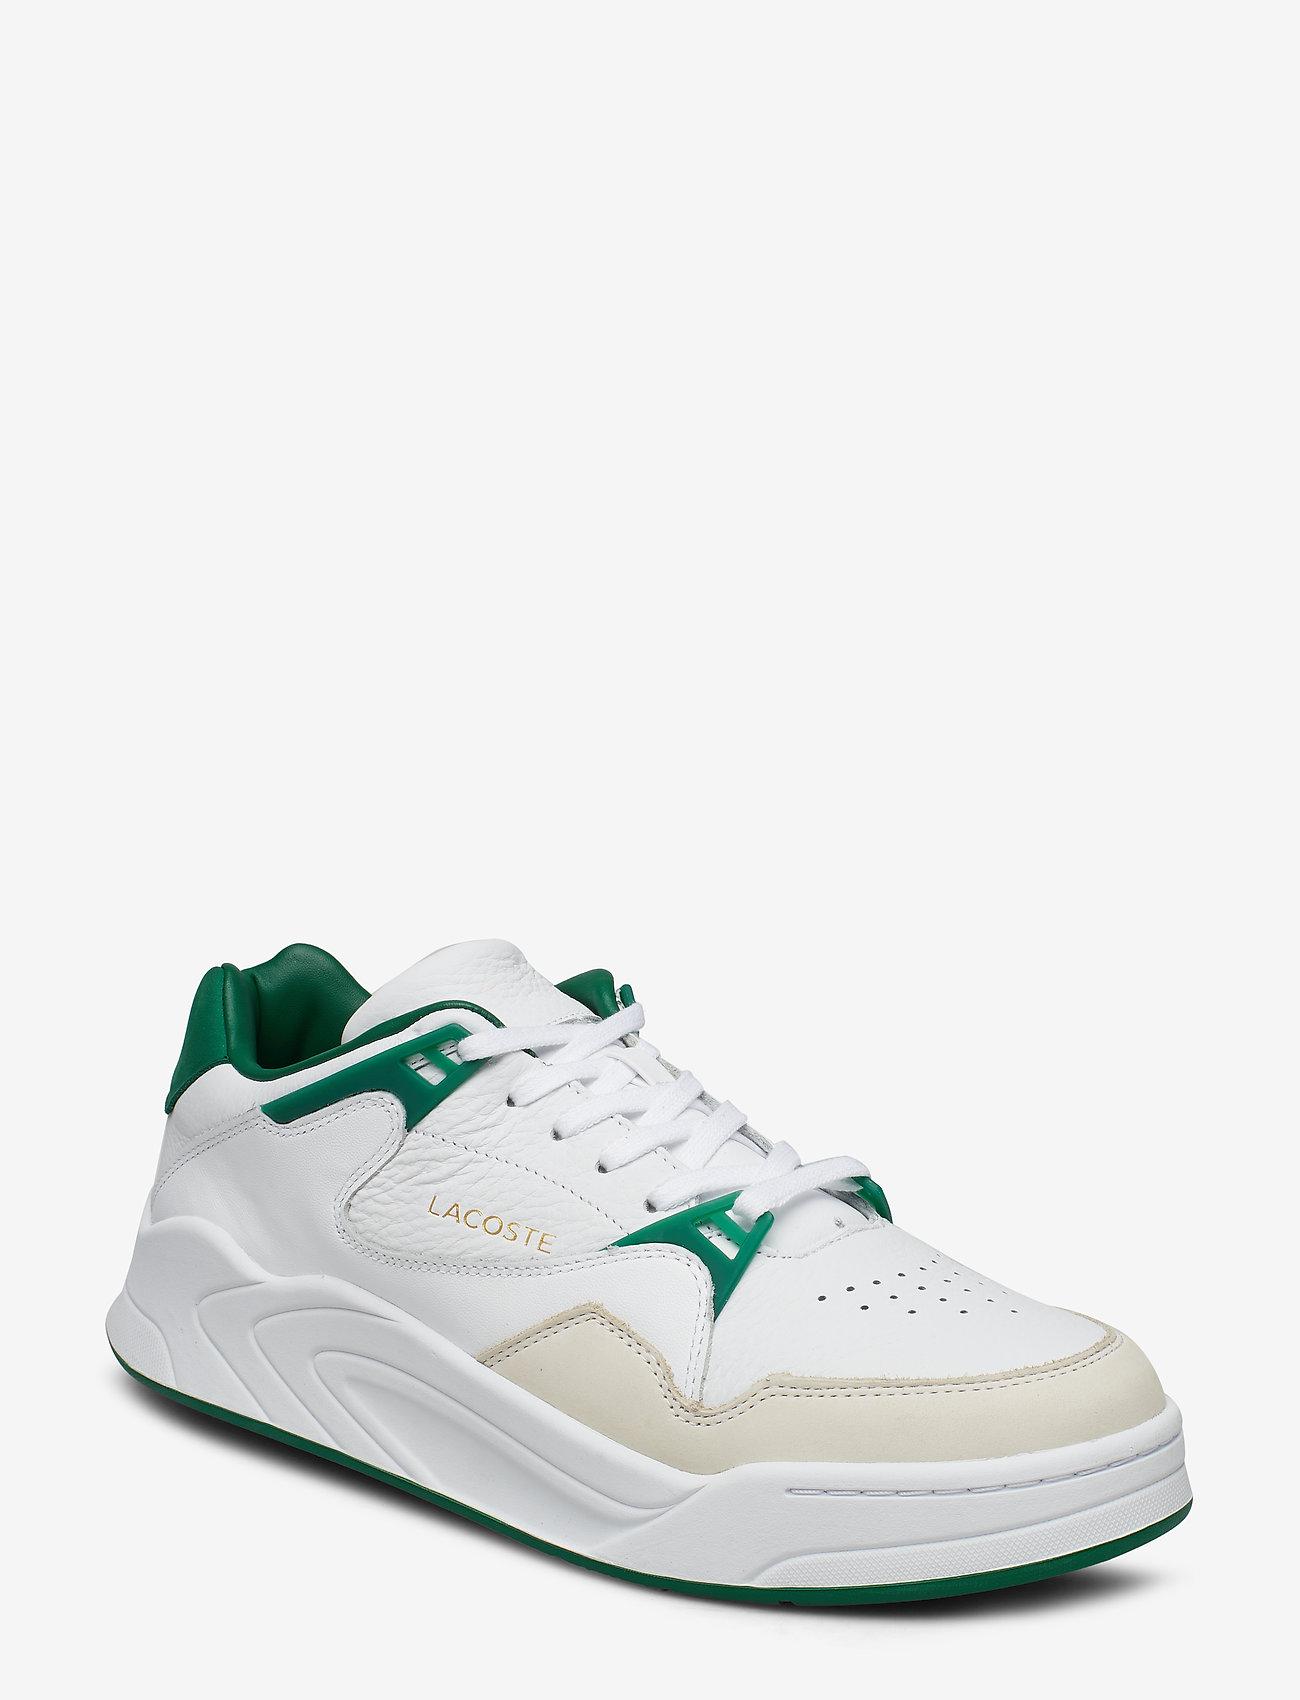 Lacoste Shoes - COURT SLAM 319 2 SMA - matalavartiset tennarit - wht/grn lth